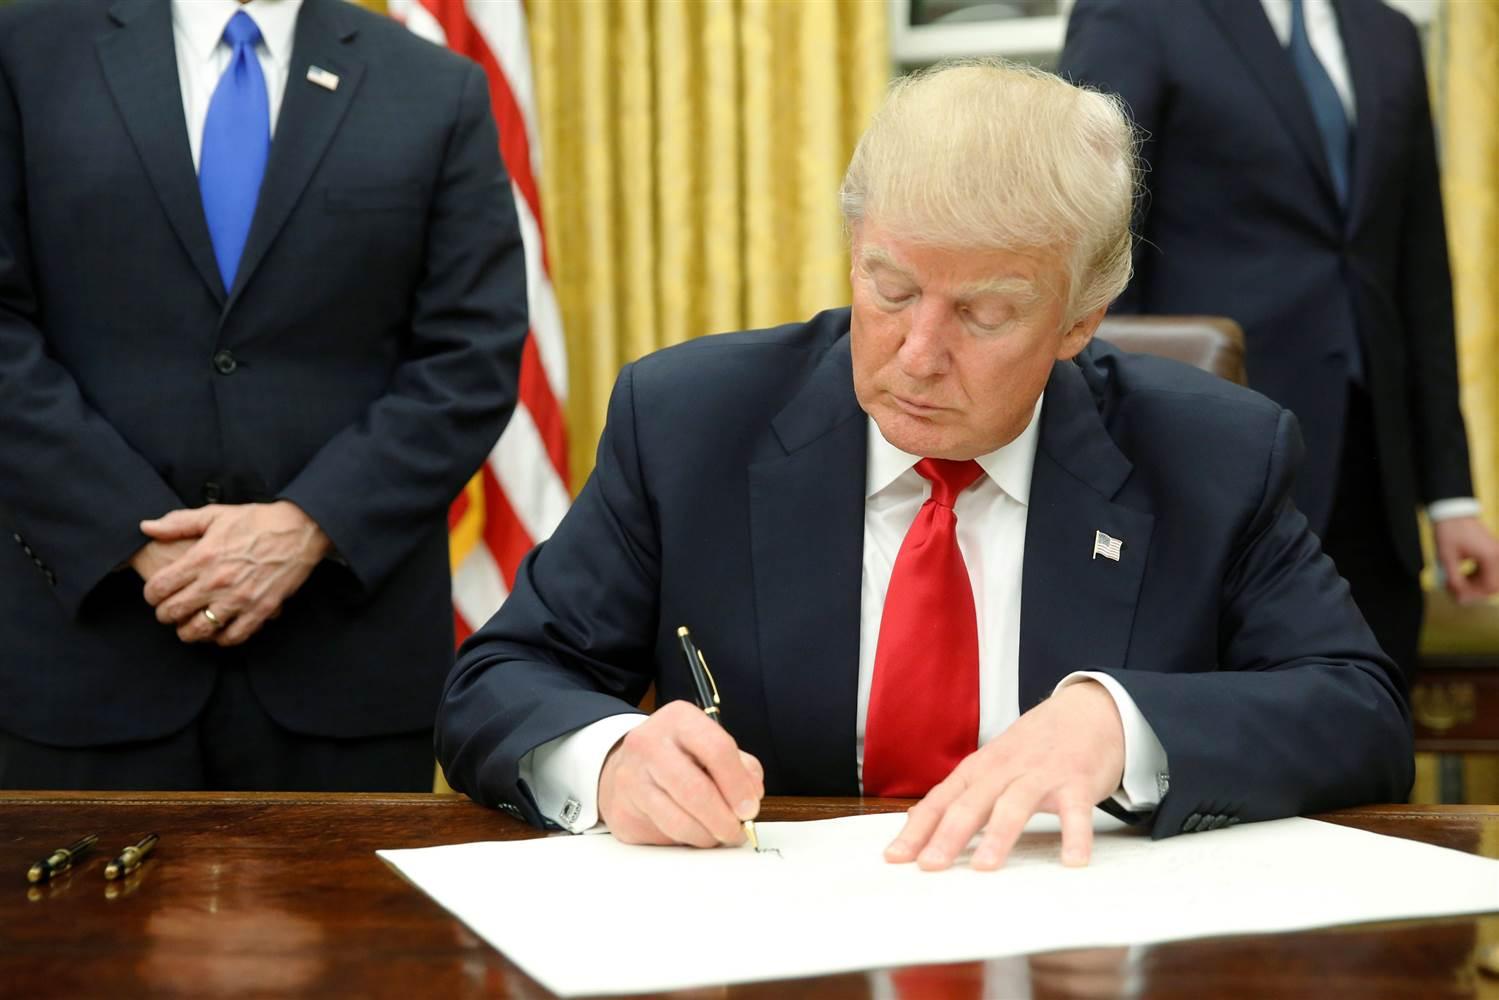 Trump_Signs_Executive_Order.jpg